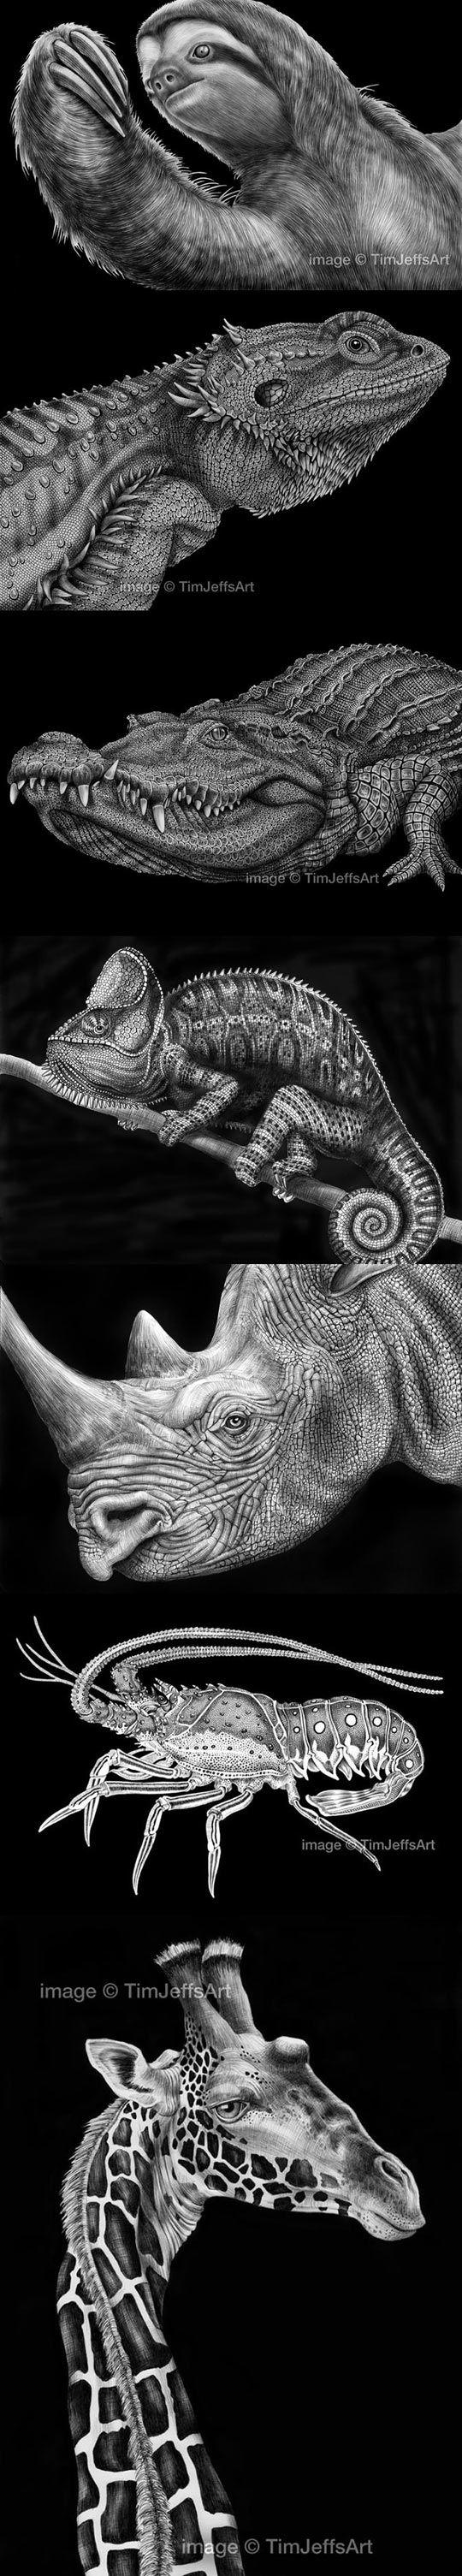 Cool Animal Drawings